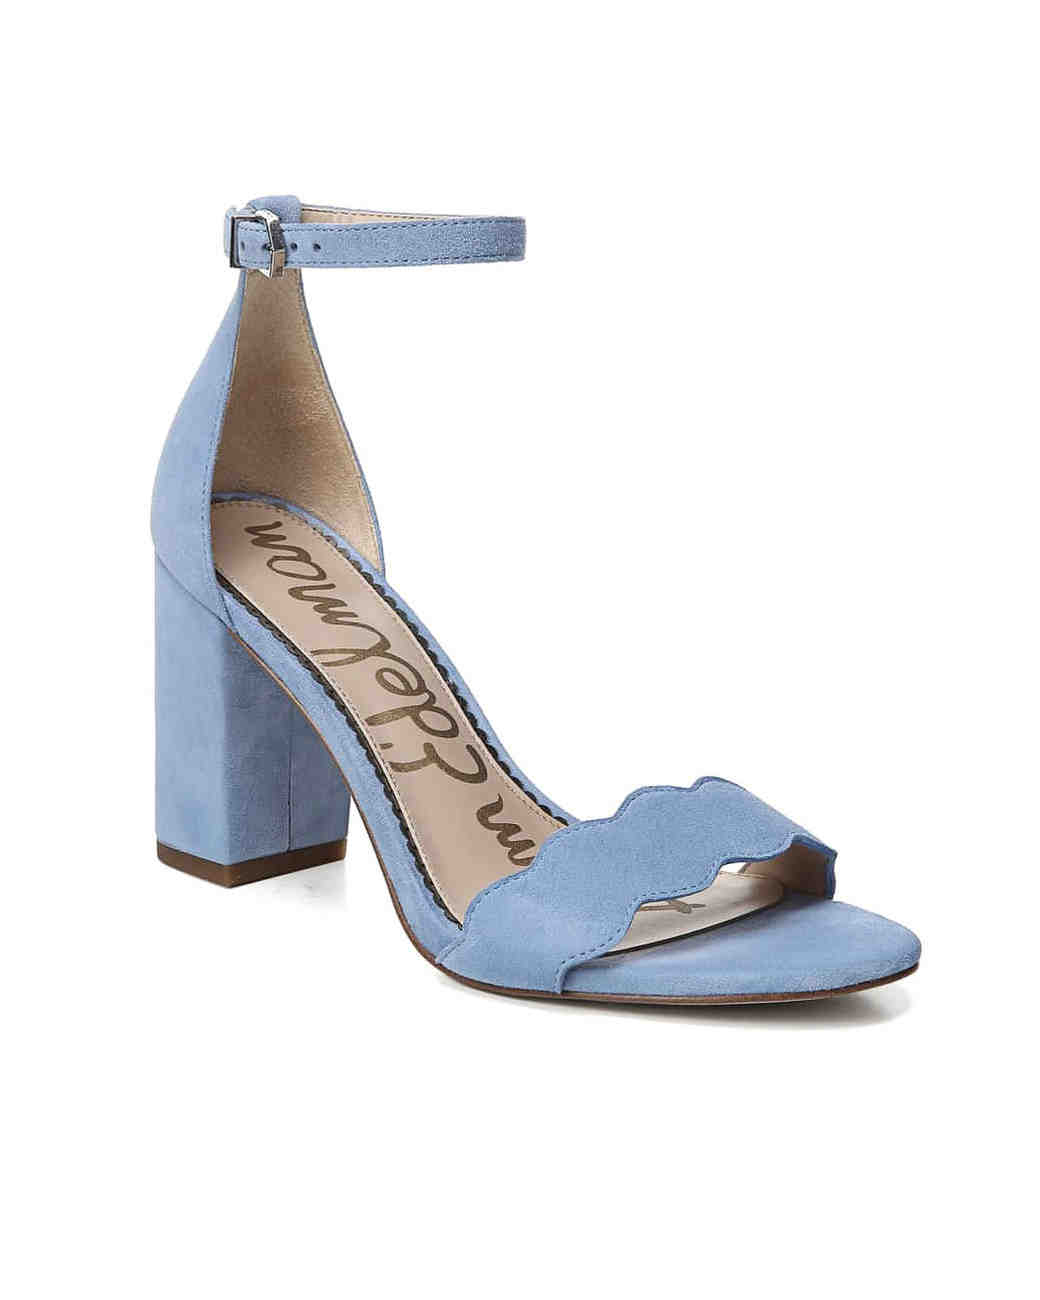 "Sam Edelman ""Odila"" Sandals"